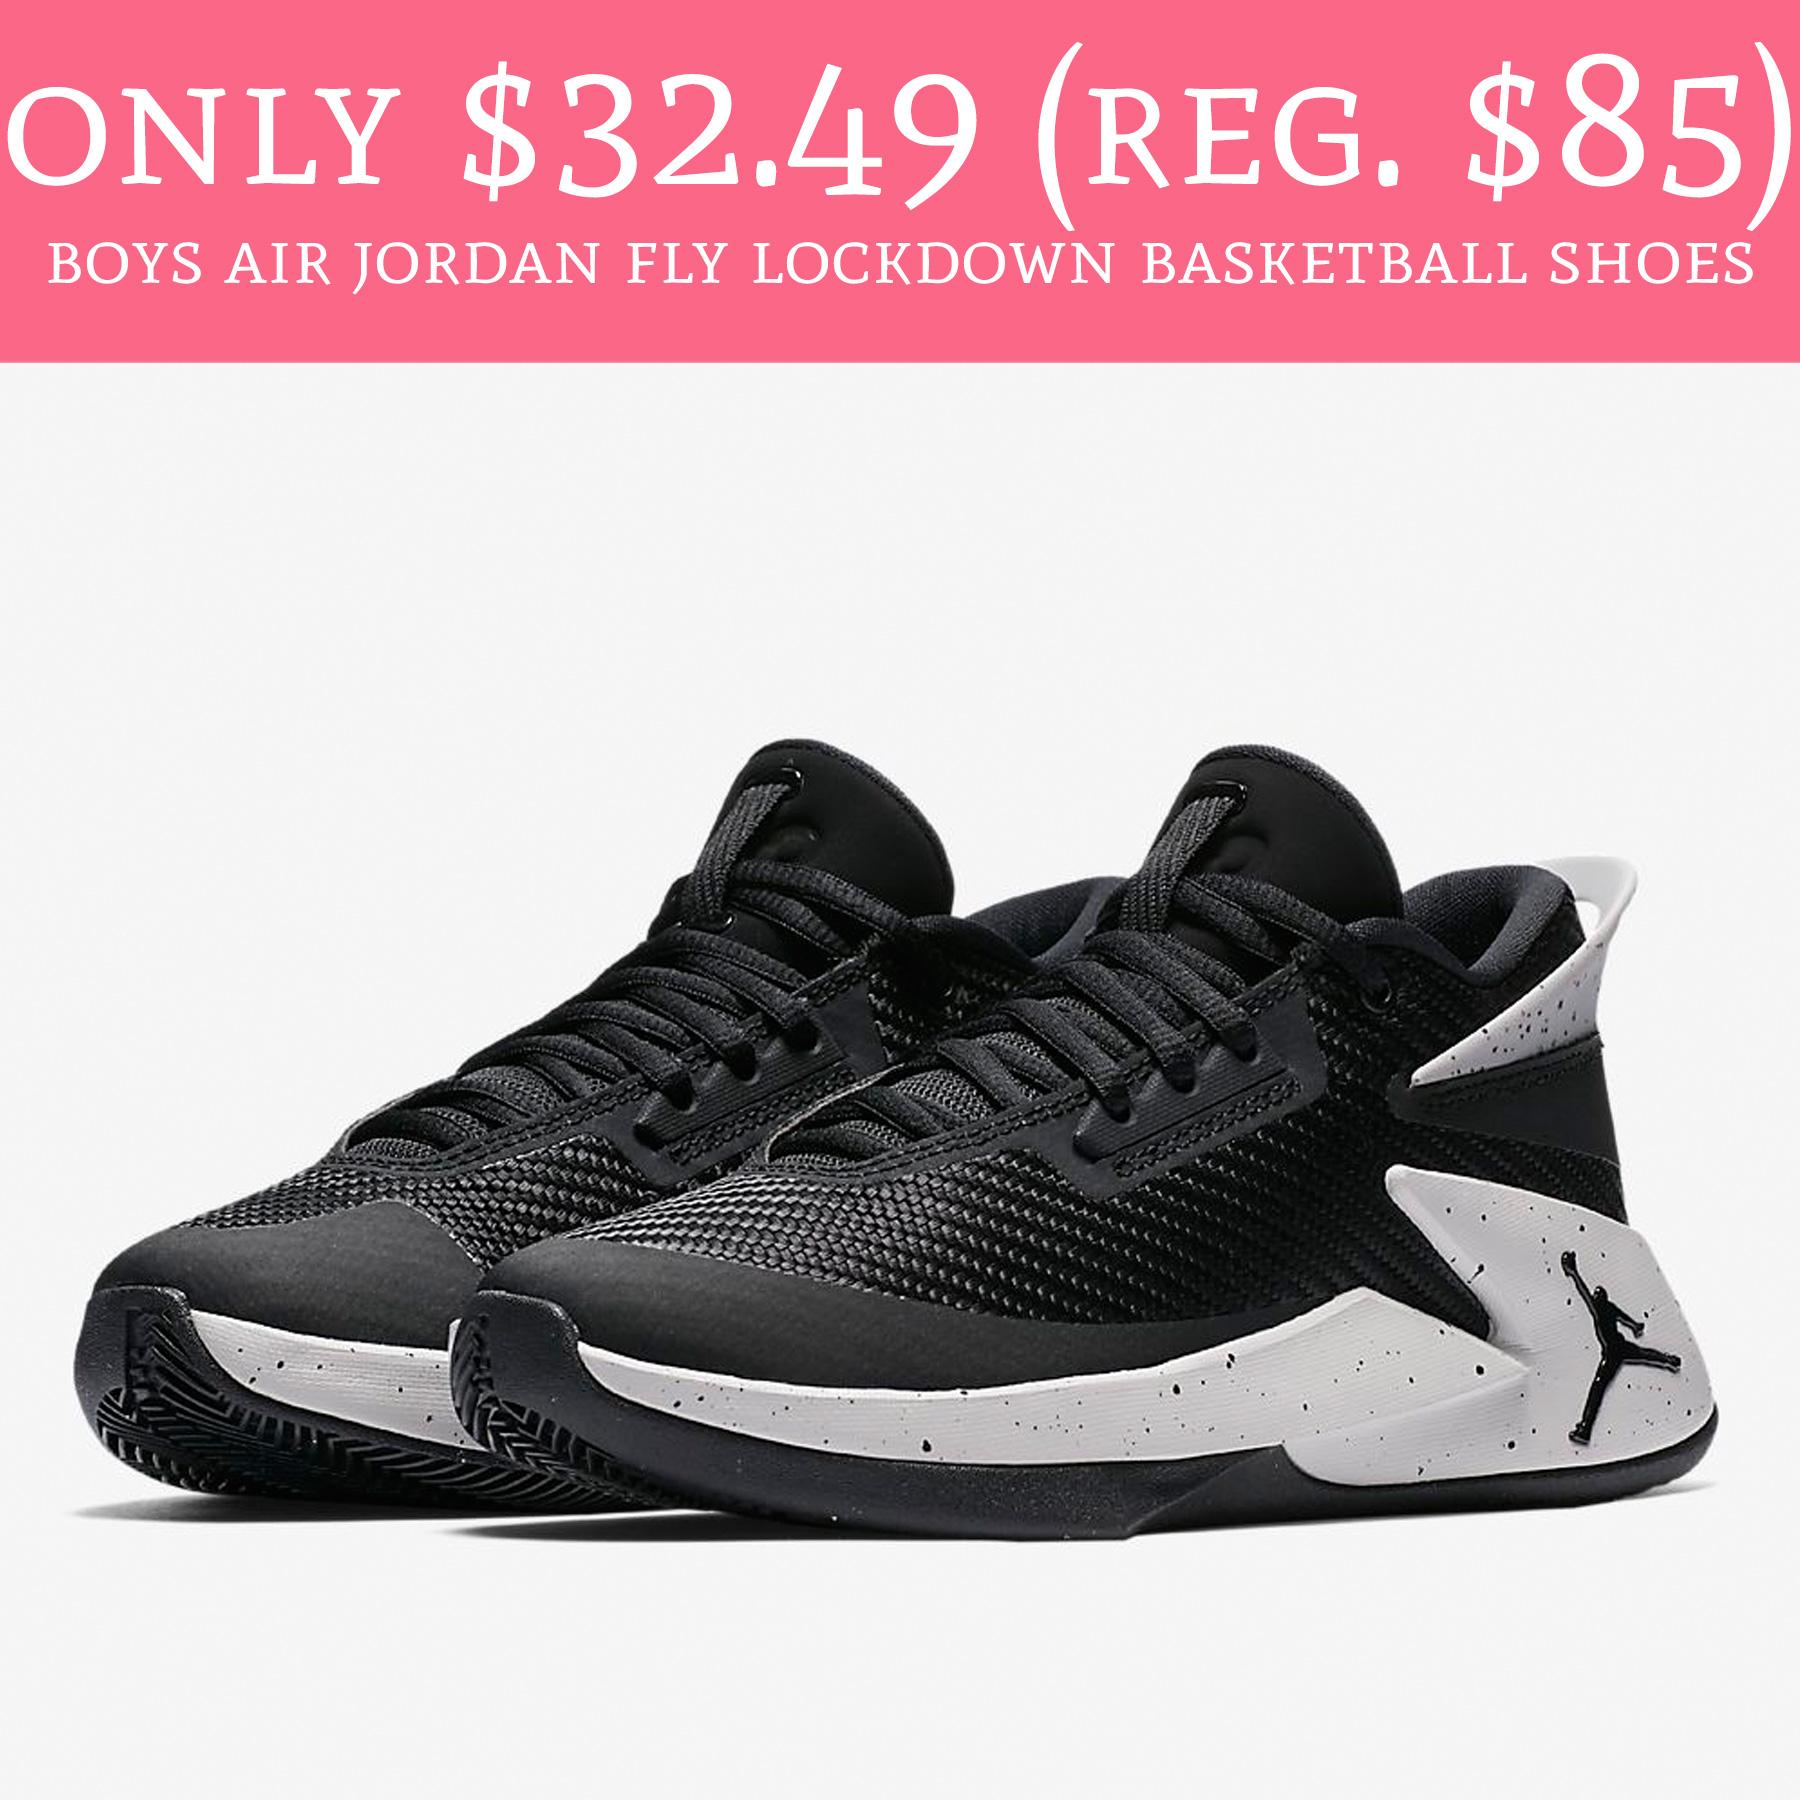 Boys Air Jordan Fly Lockdown Basketball